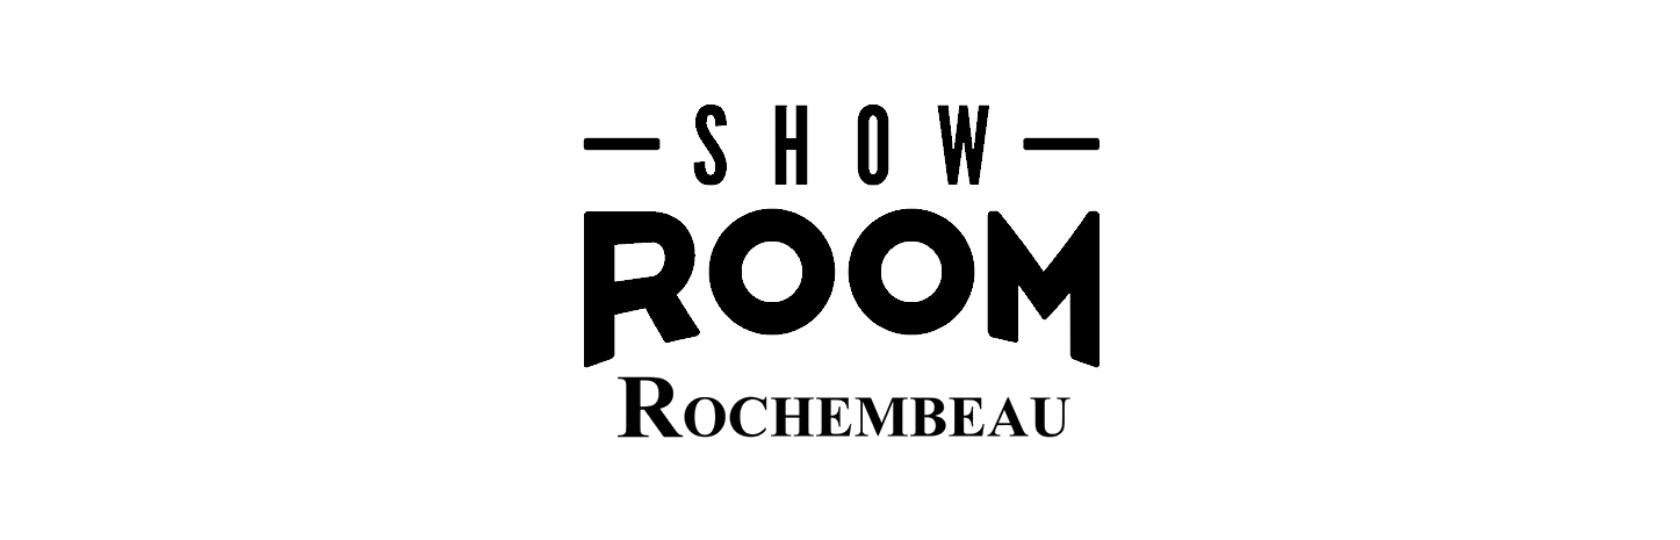 Accueil Rochembeau Mobilier Brest